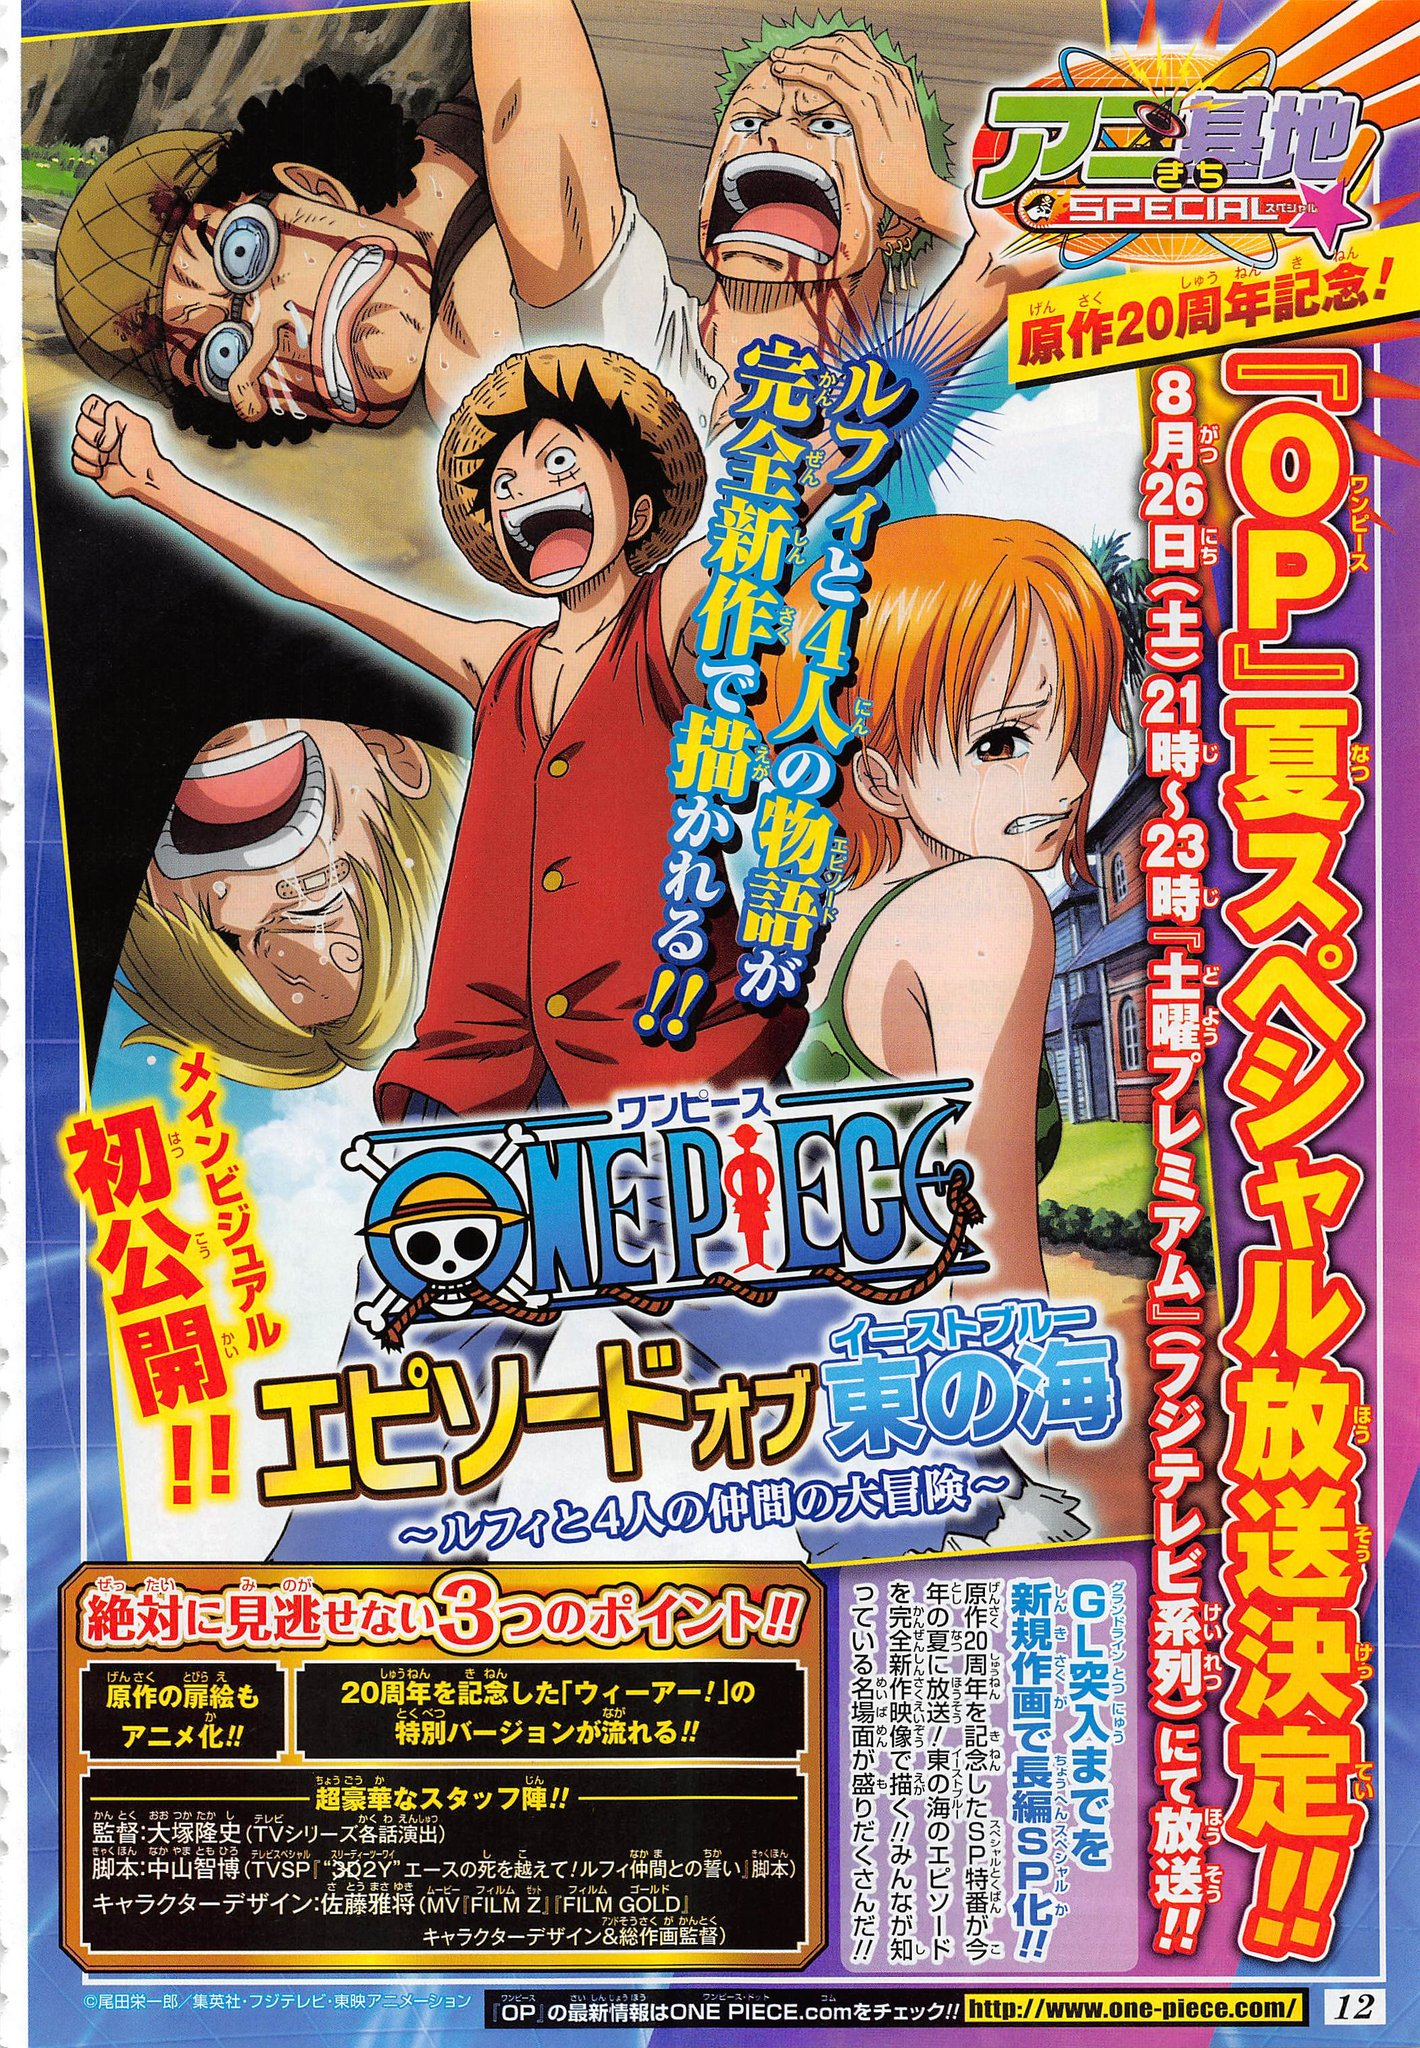 One Piece Episode Of East Blue : piece, episode, Piece, Episode, Visual, OnePiece